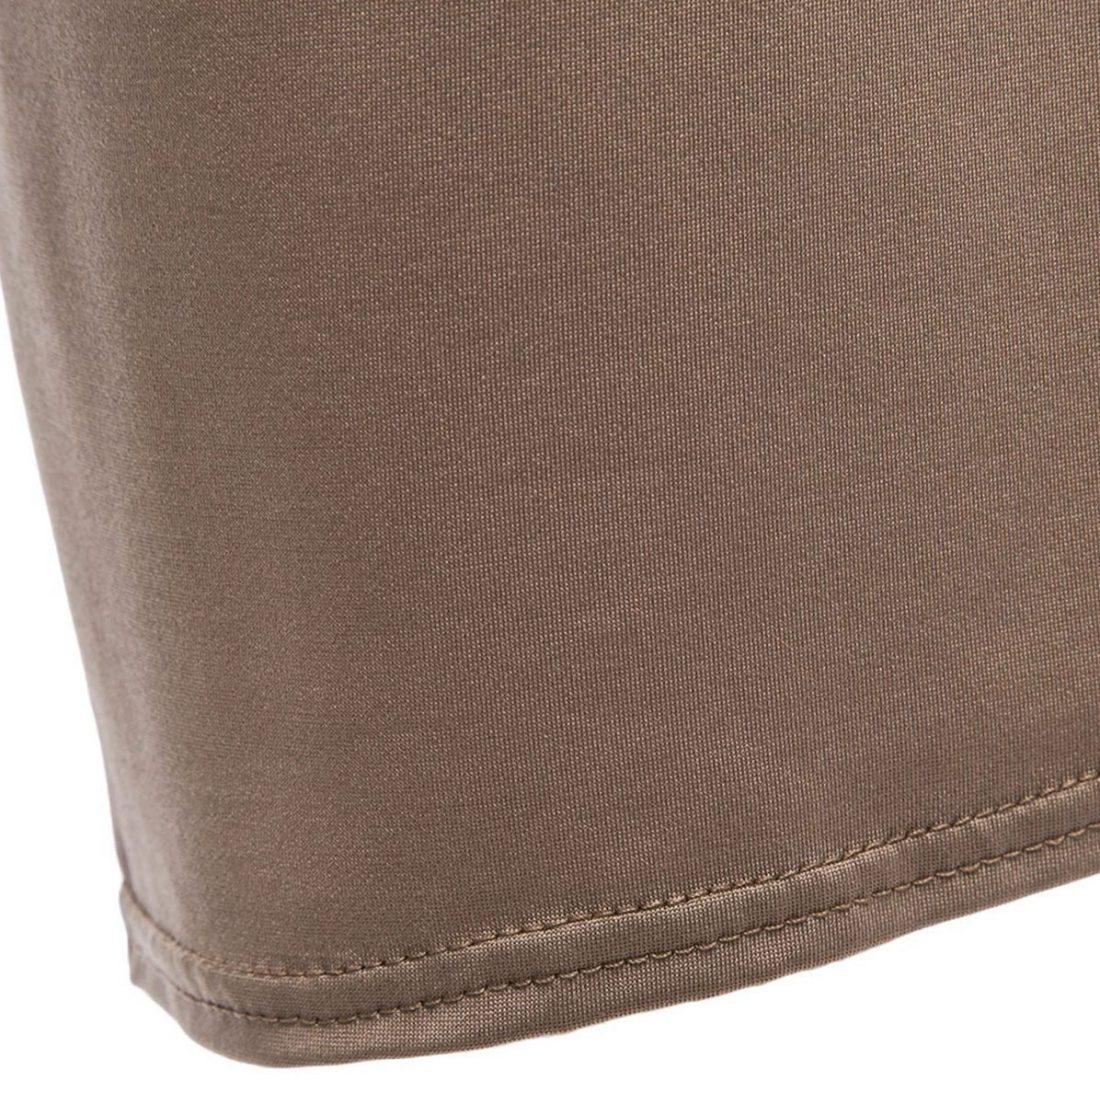 M0182 khaki7 Side Split Skirts maureens.com boutique